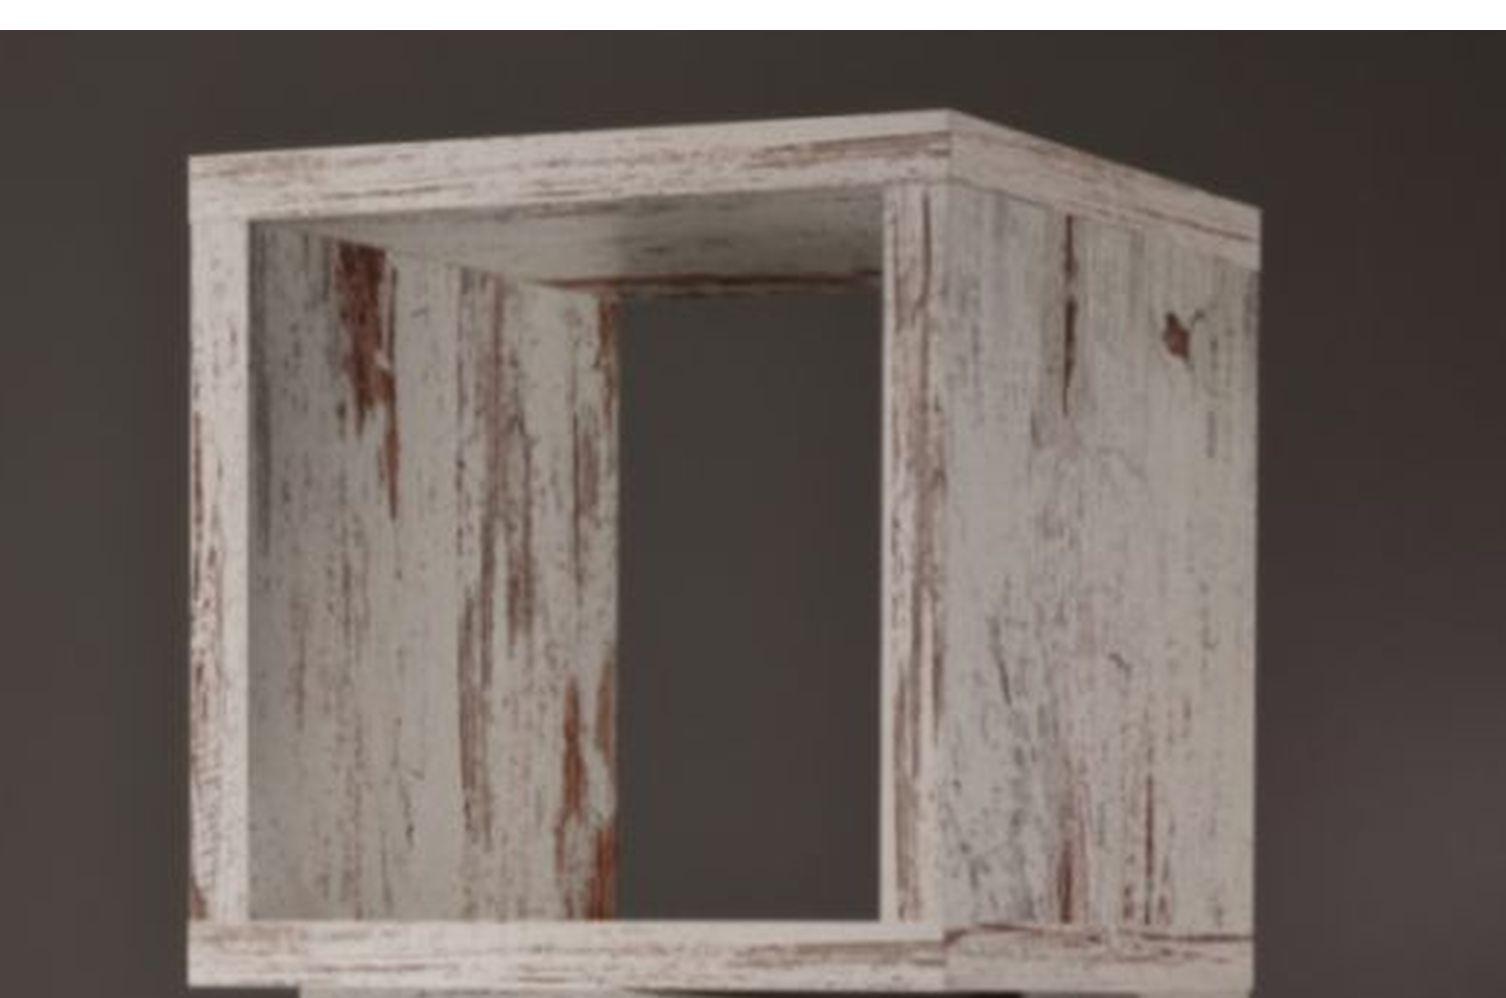 w rfelset cub wandregal cubes h ngeregale neu modern regale aufbewahrung ebay. Black Bedroom Furniture Sets. Home Design Ideas